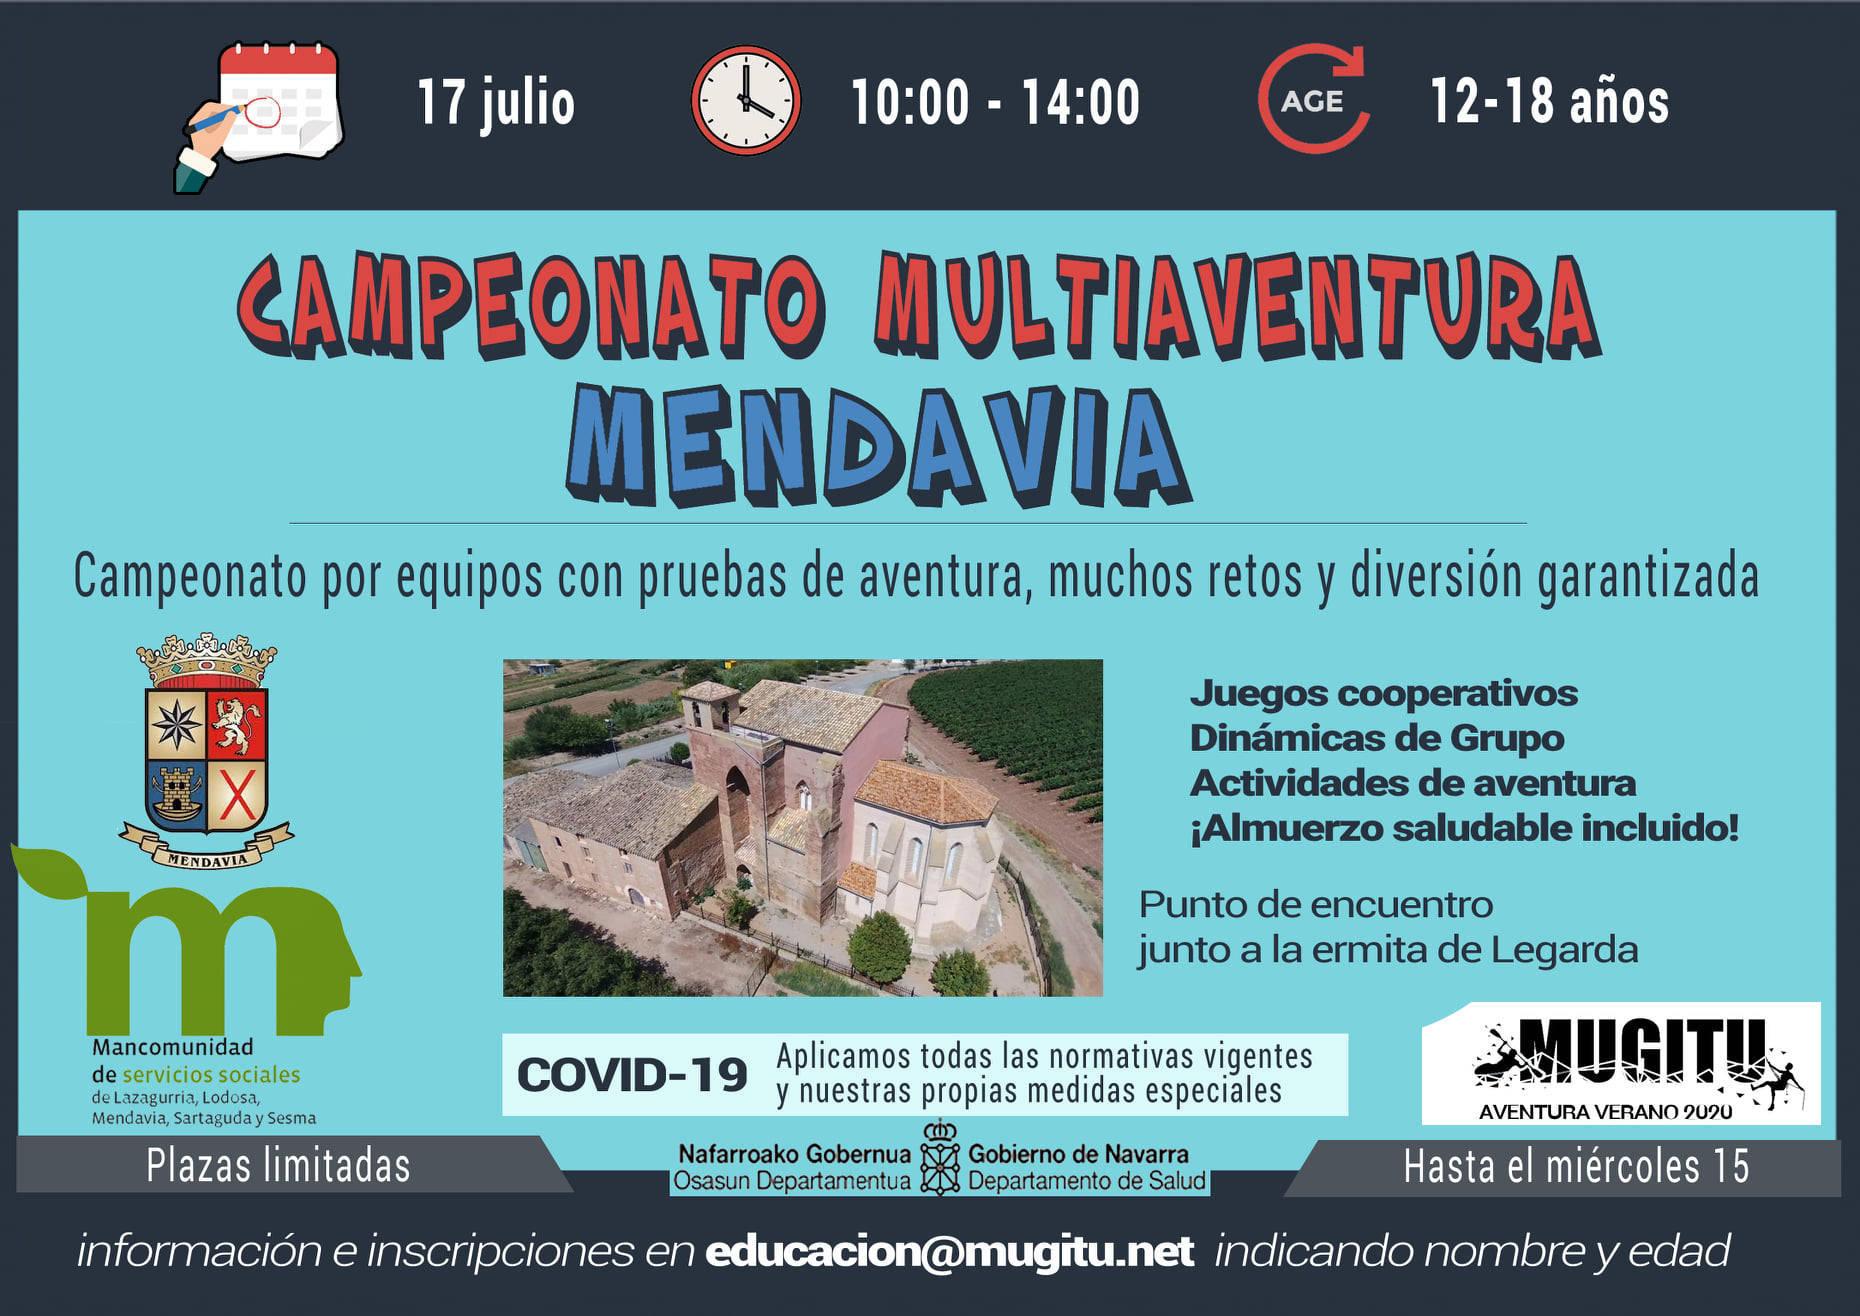 Campeonato multiaventura 2020 - Mendavia (Navarra)